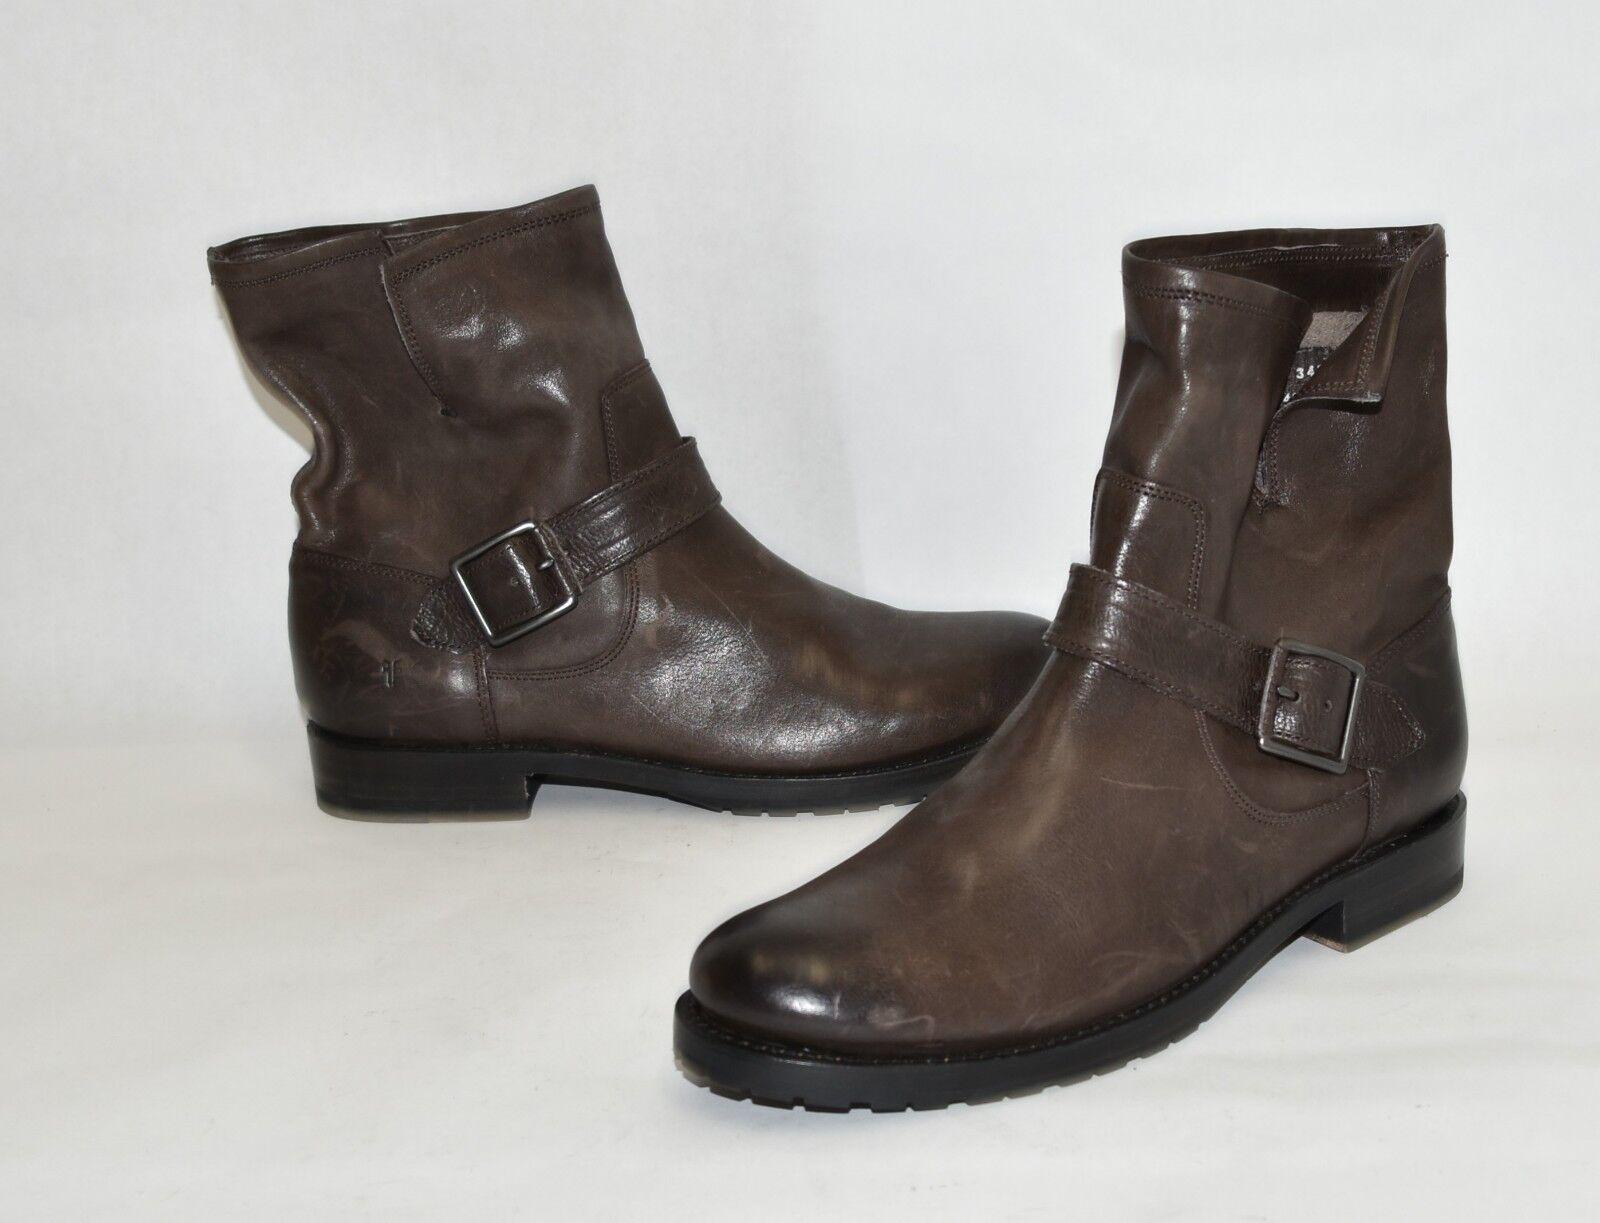 New Frye Natalie Short Engineer Lug Boot Charcoal Brown Pelle Size 9 3478513